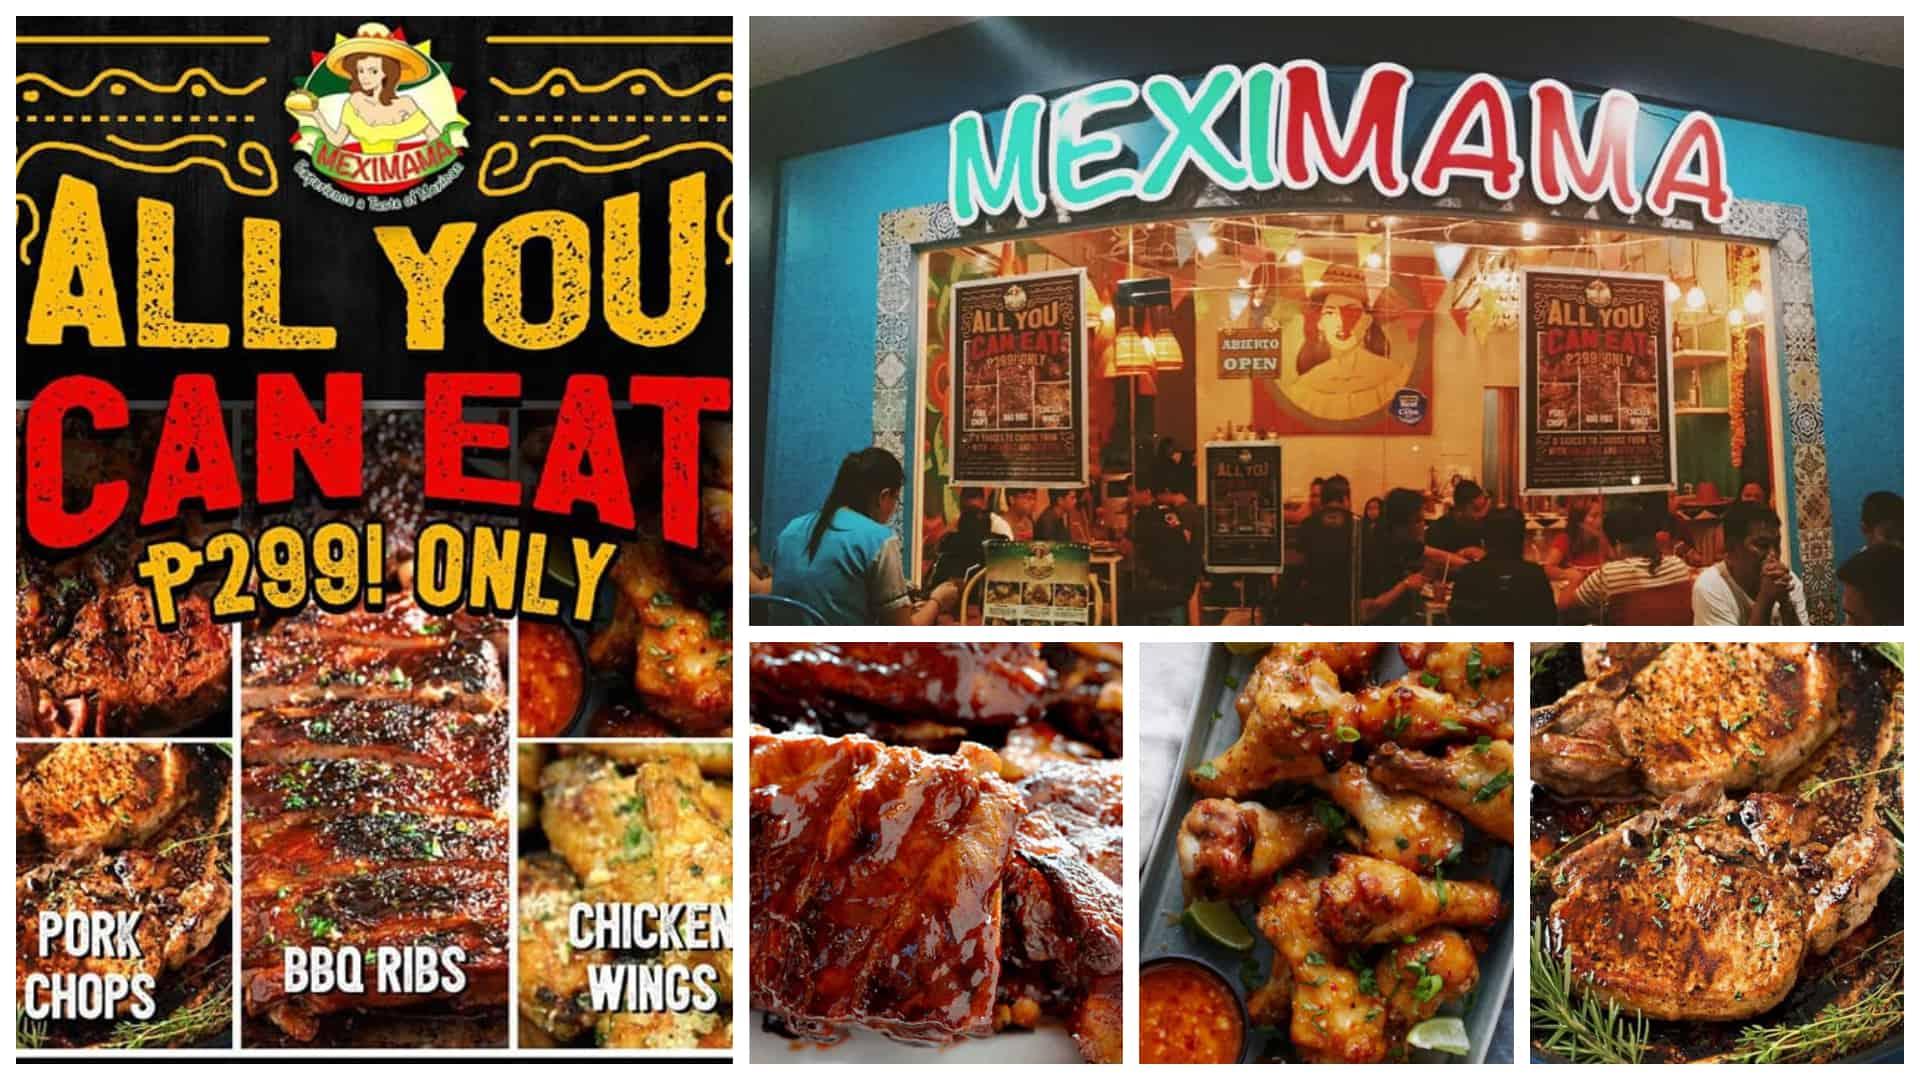 cebu eats unlimited ribs wings pork chops for u20b1299 at meximama rh sugbo ph